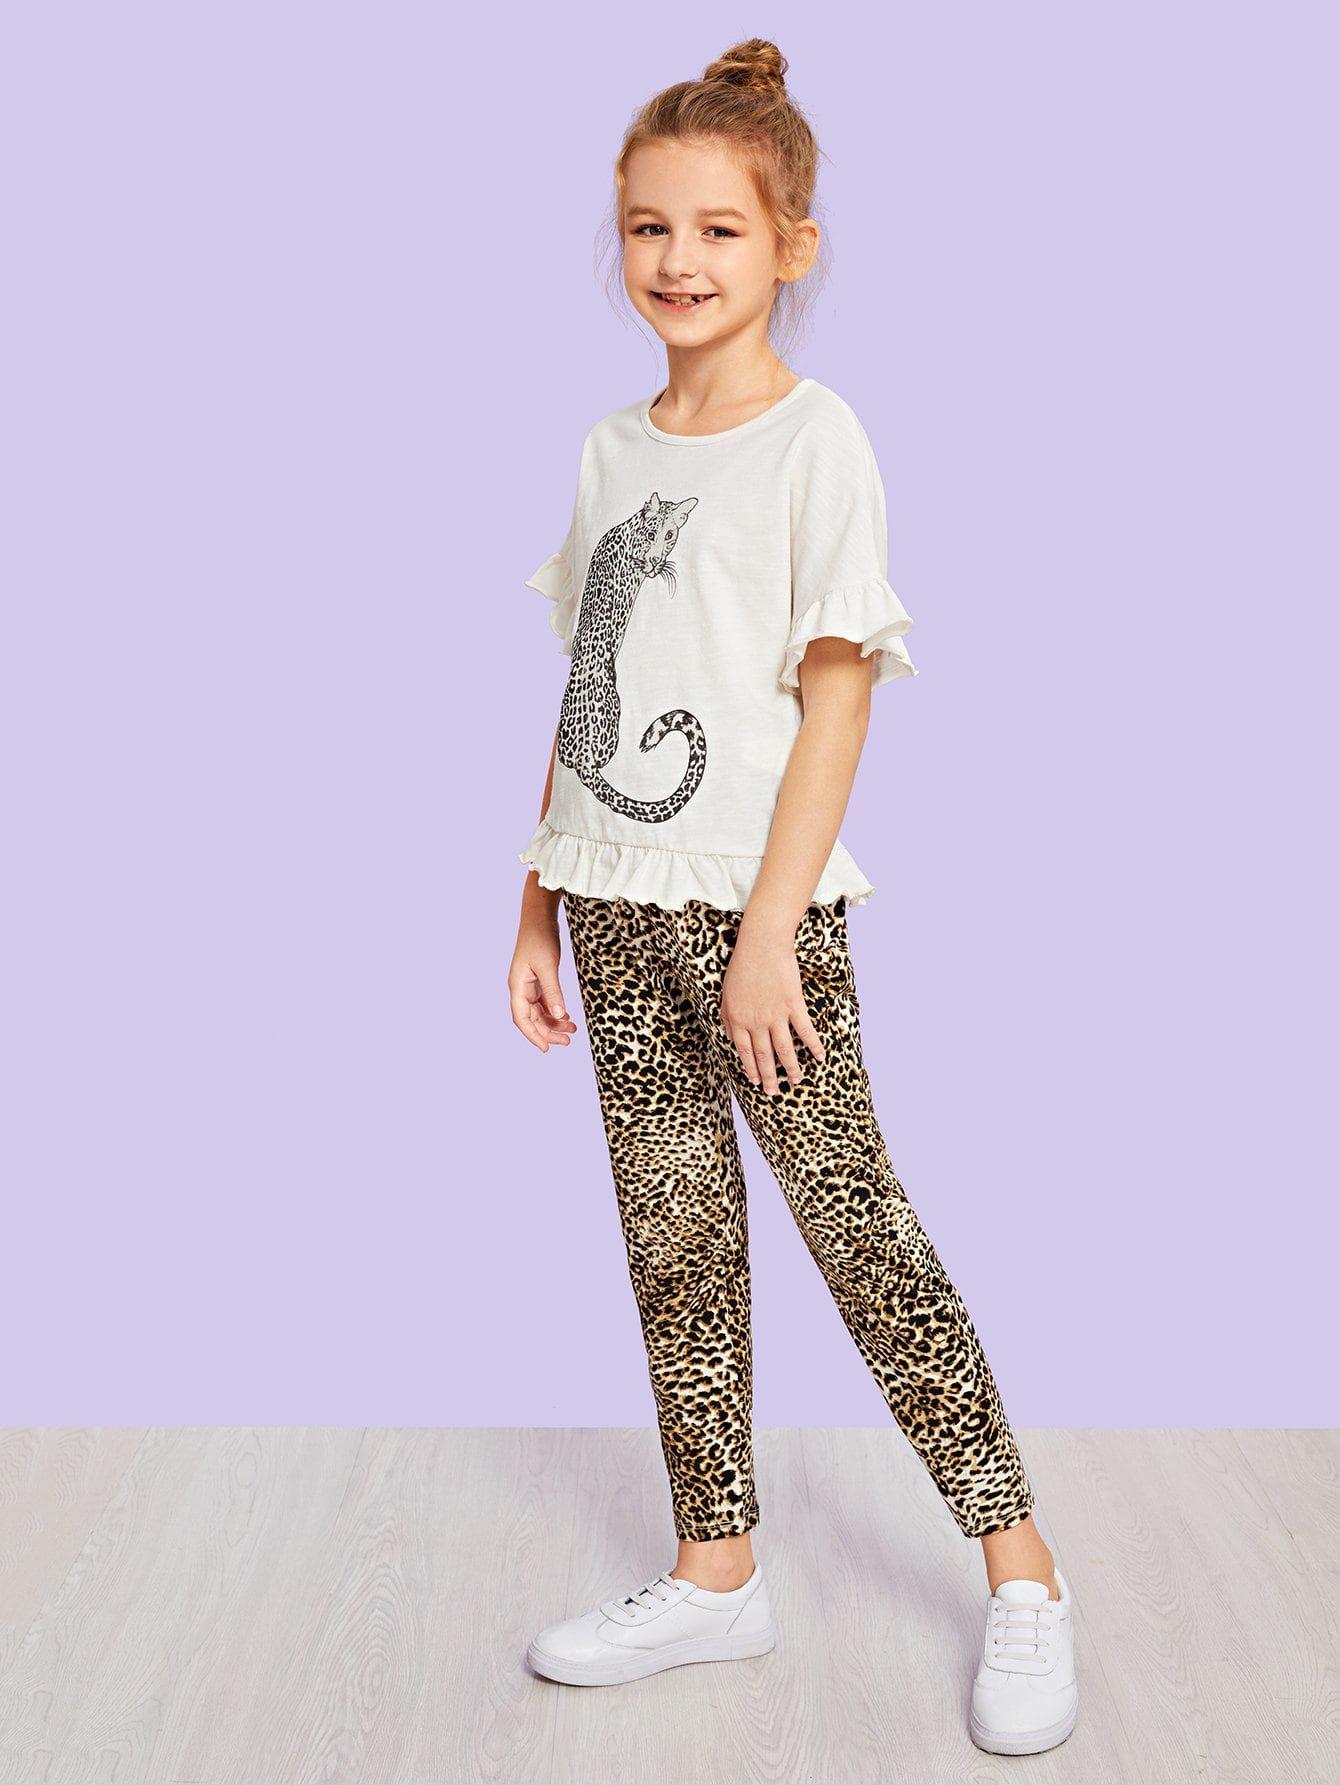 566e7d1d43b4 Girls Ruffle Animal Print Tee & Leopard Print Pants Set #clothes #girls # fashion #trend #moda #women #dress